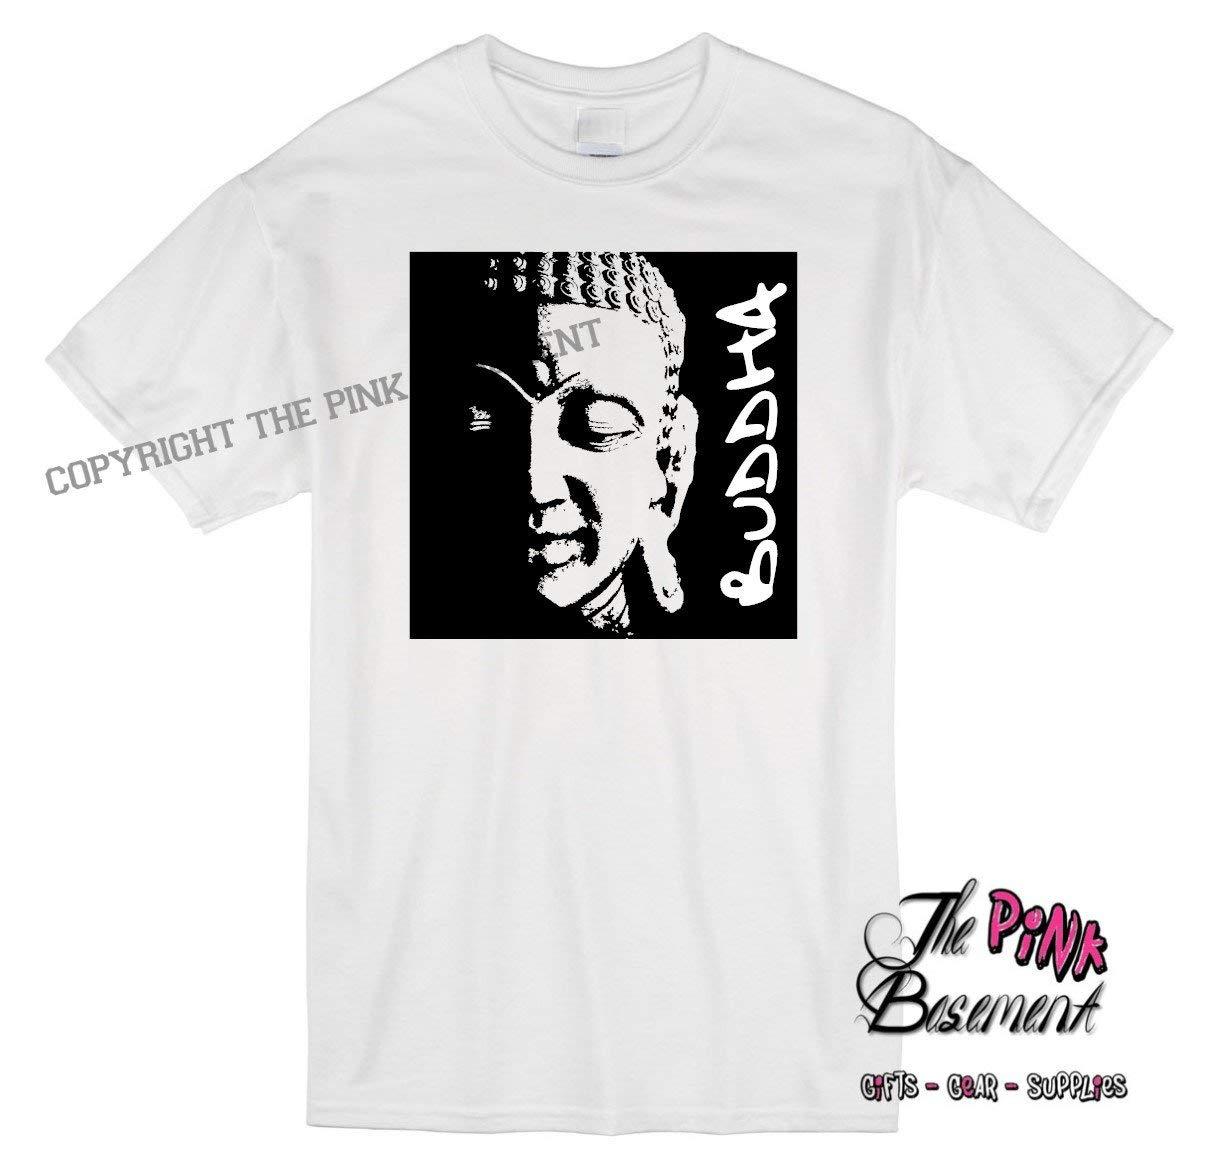 HANDMADE Adult Buddha religion religious zen Unisex Mens Womens Best Friend Tshirt T Shirt Ladies mens gift Humor Personalized Punk Goth Metal